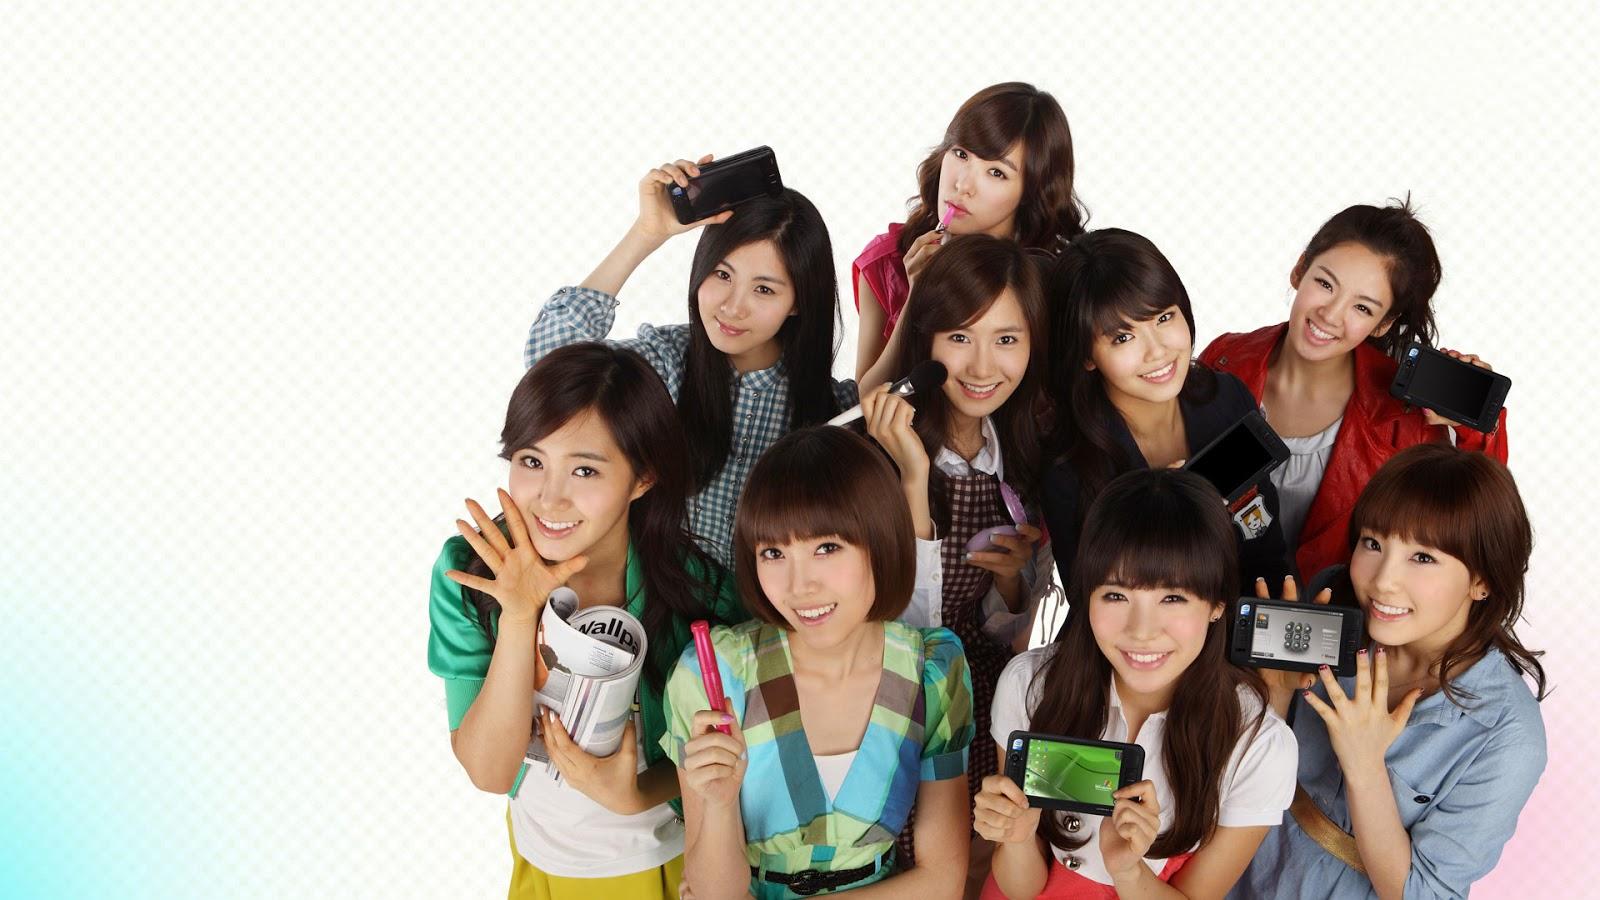 Girls hd wallpaper mobile add